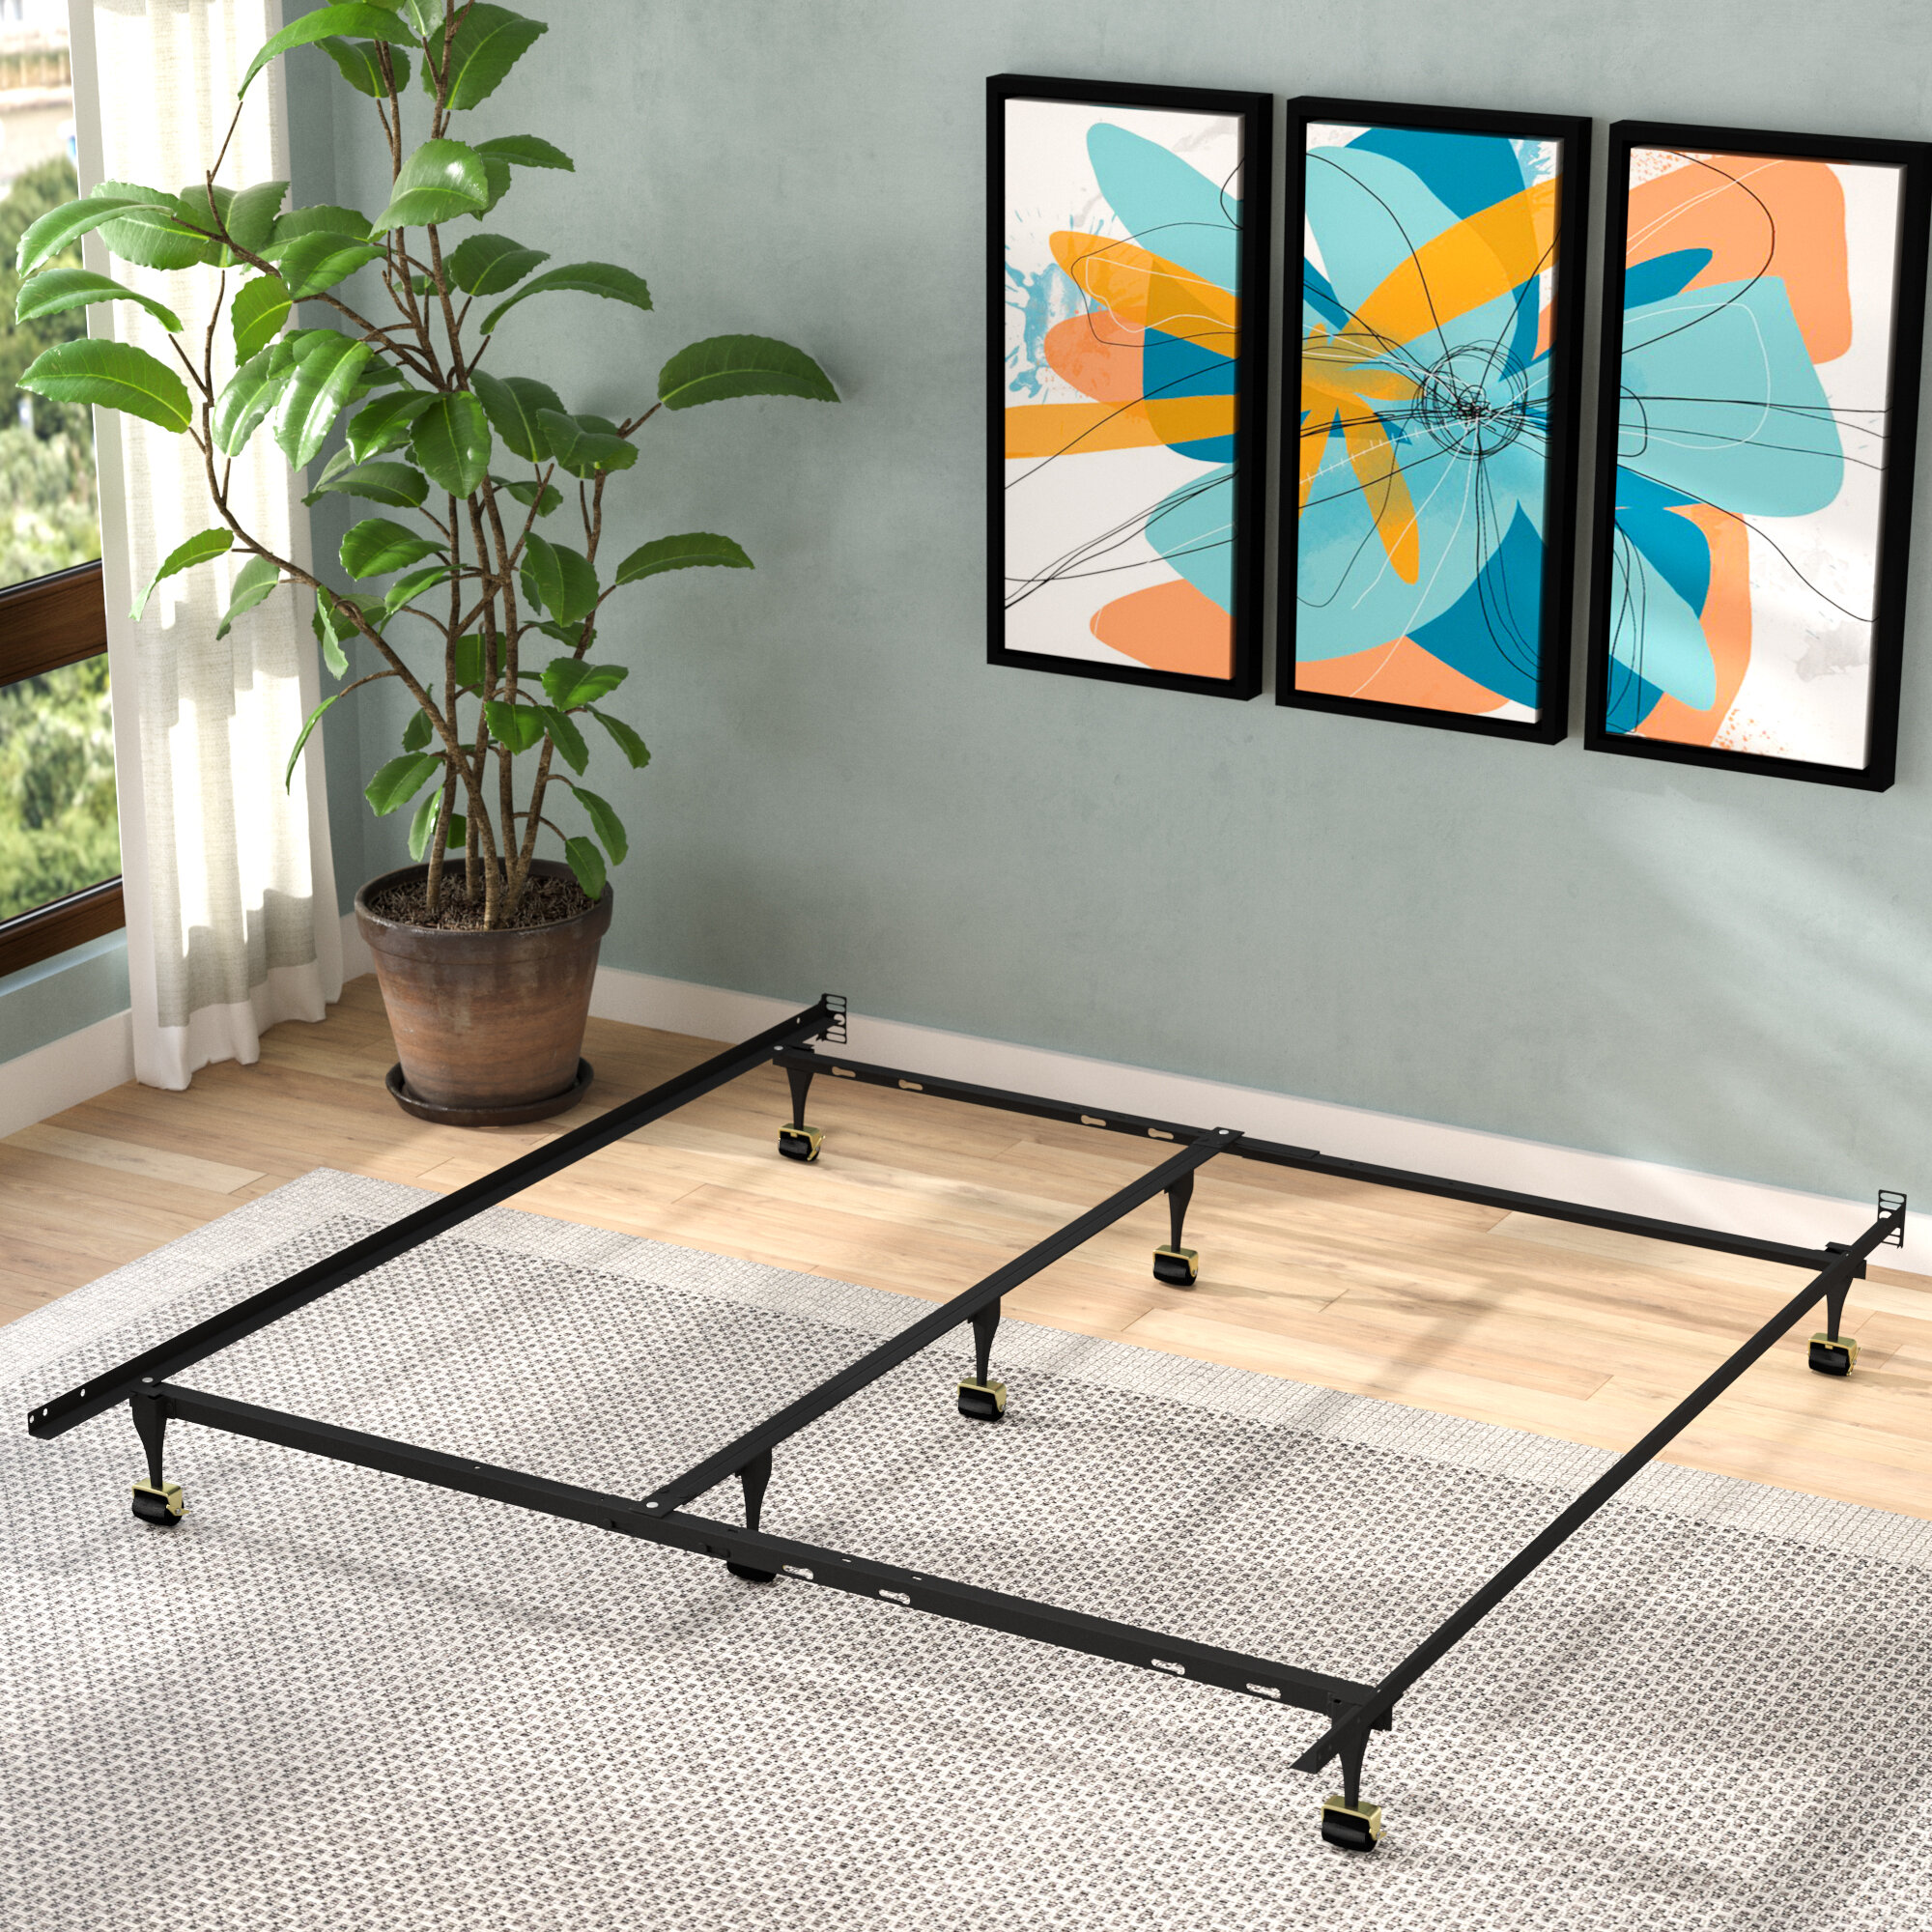 Alwyn Home Caulkins Heavy Duty Adjustable Metal Bed Frame With